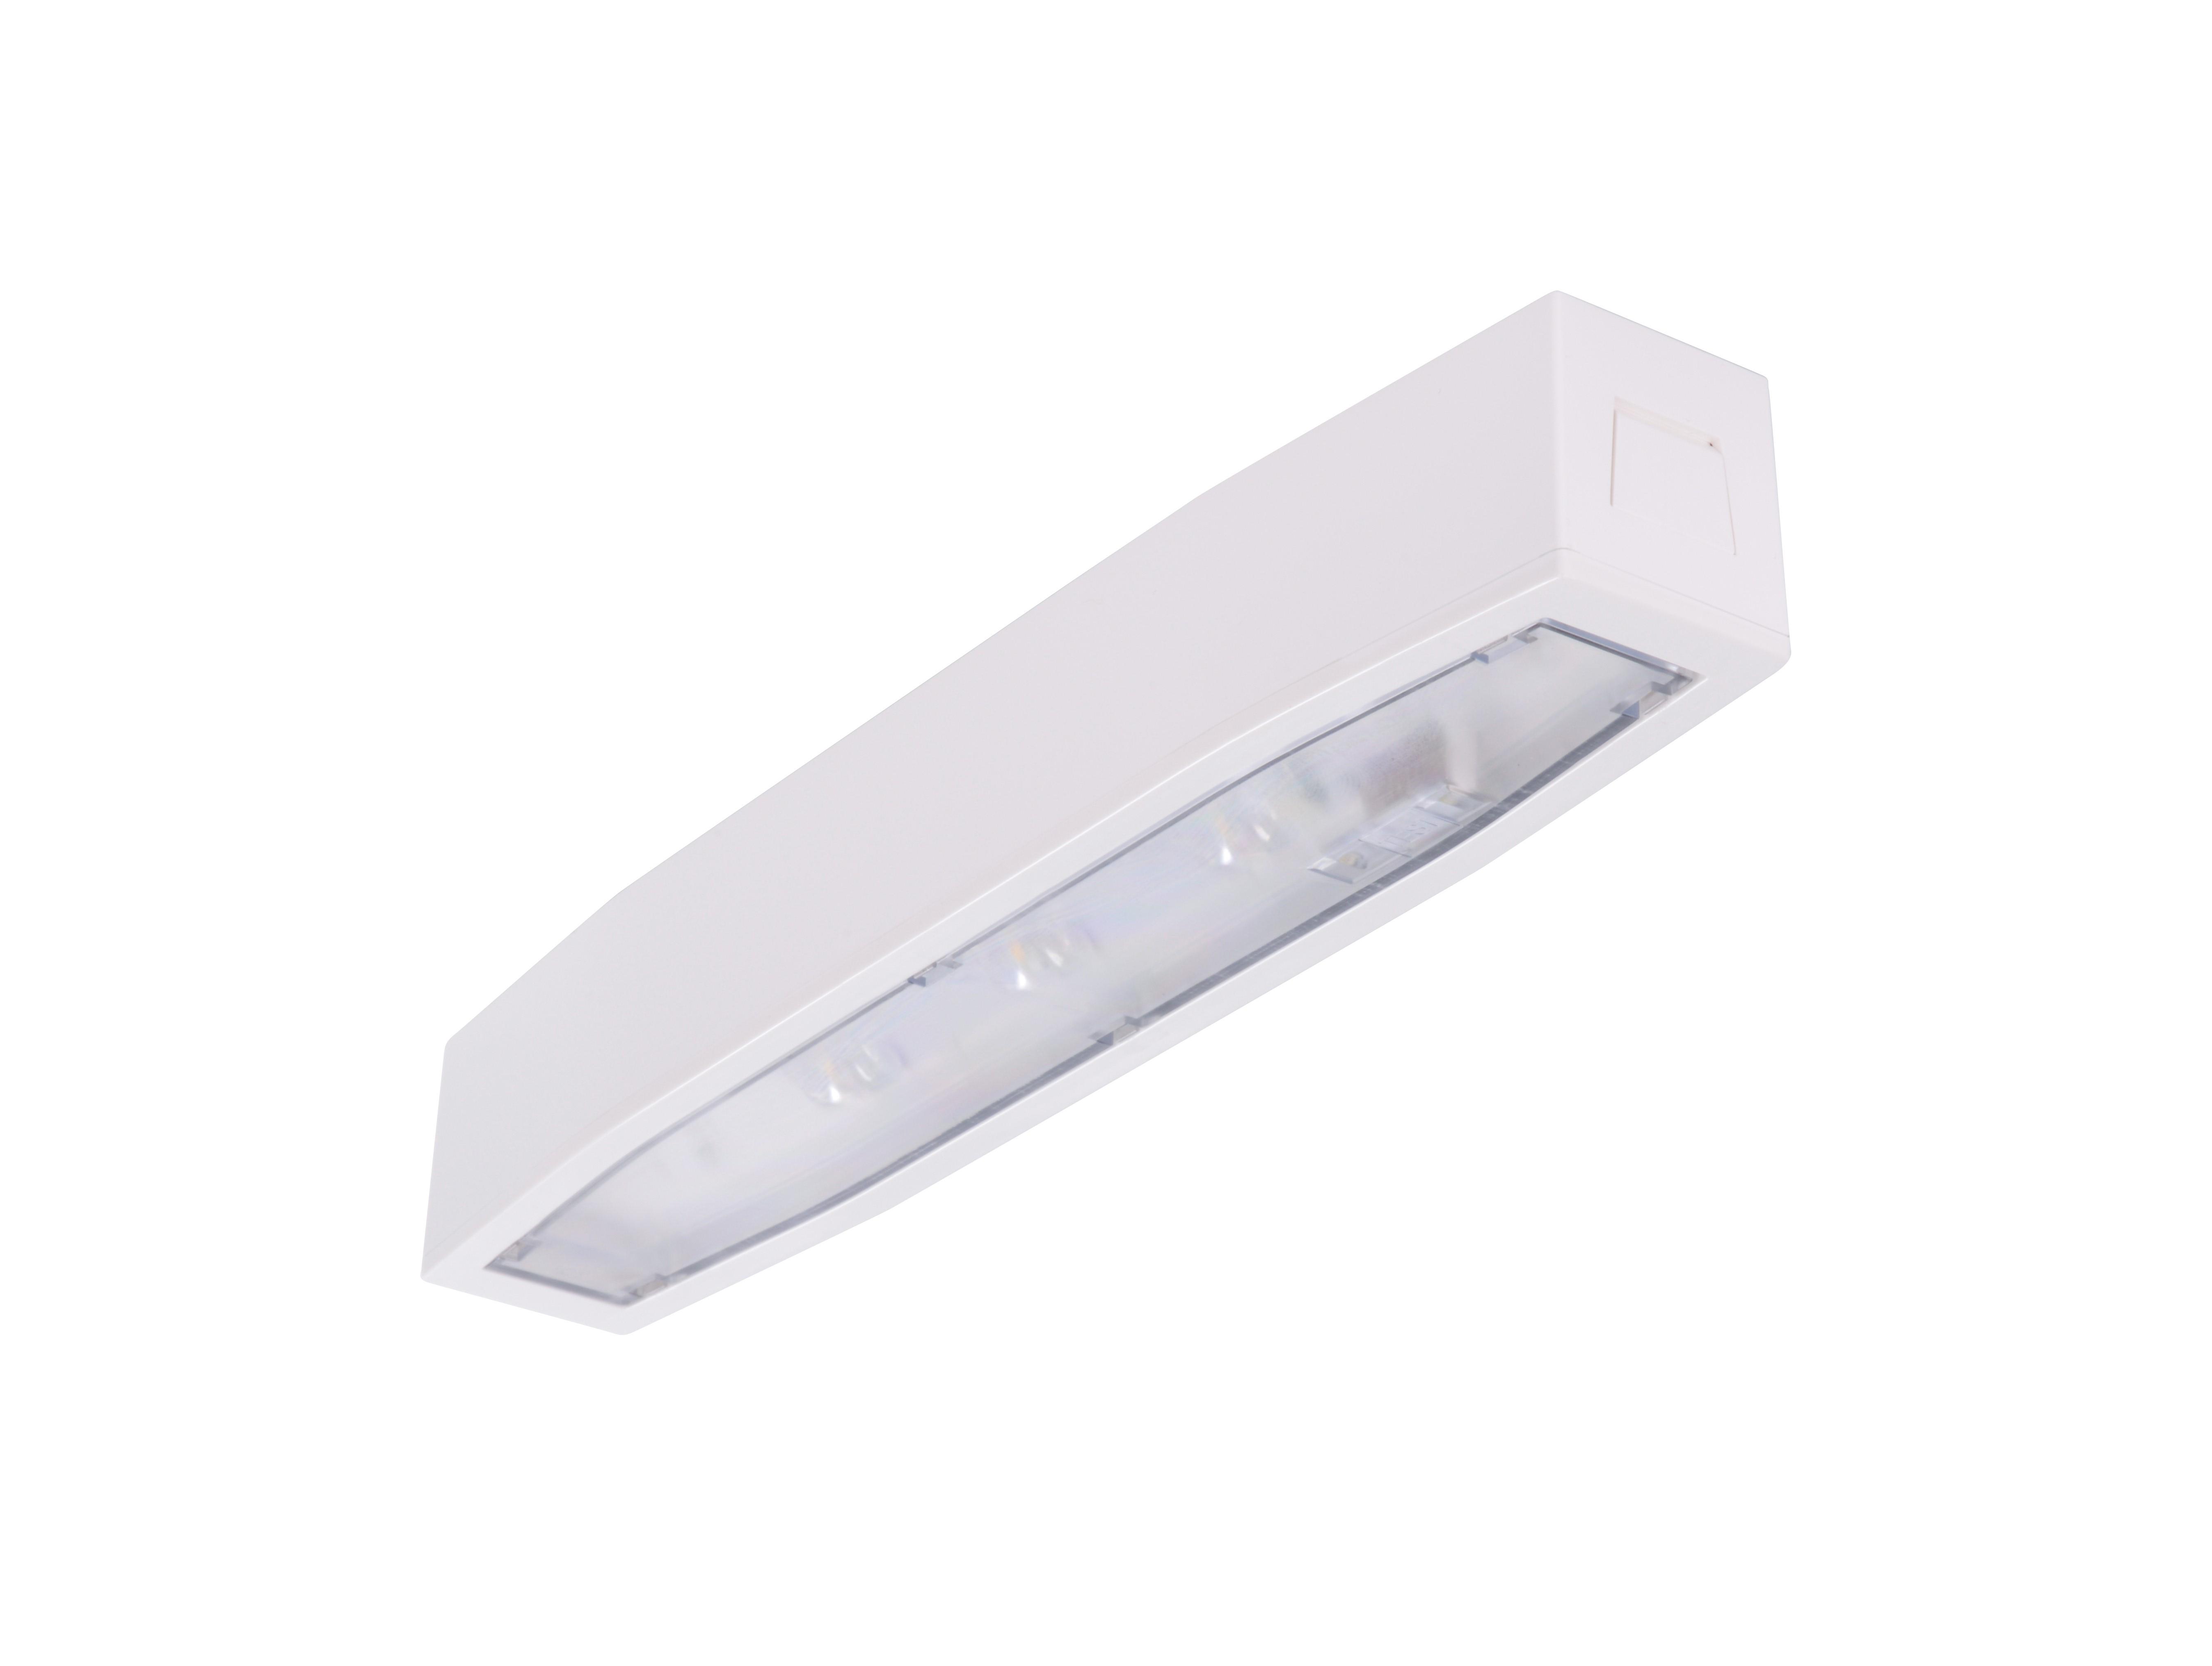 Lampa emergenta led Intelight 94517   3h mentinut test automat 0